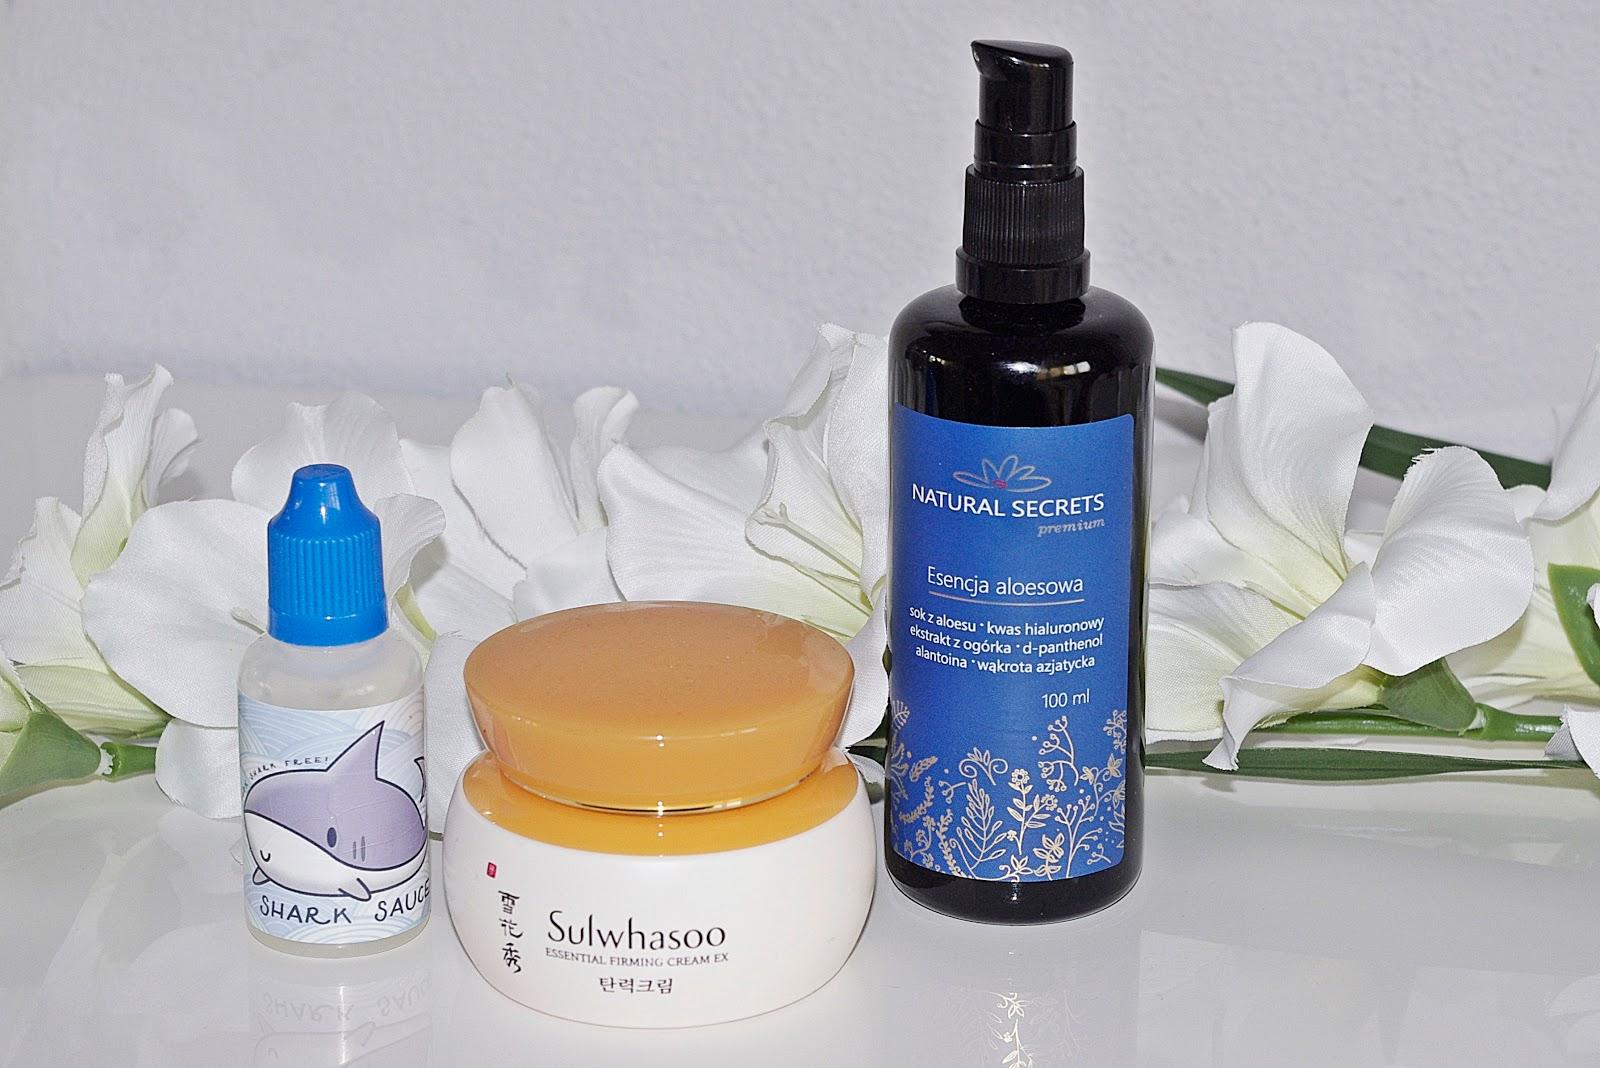 Holy Snail Shark Sauce Sulwhasoo Essential Firming Cream EX Esencja Aloesowa Natural Secrets